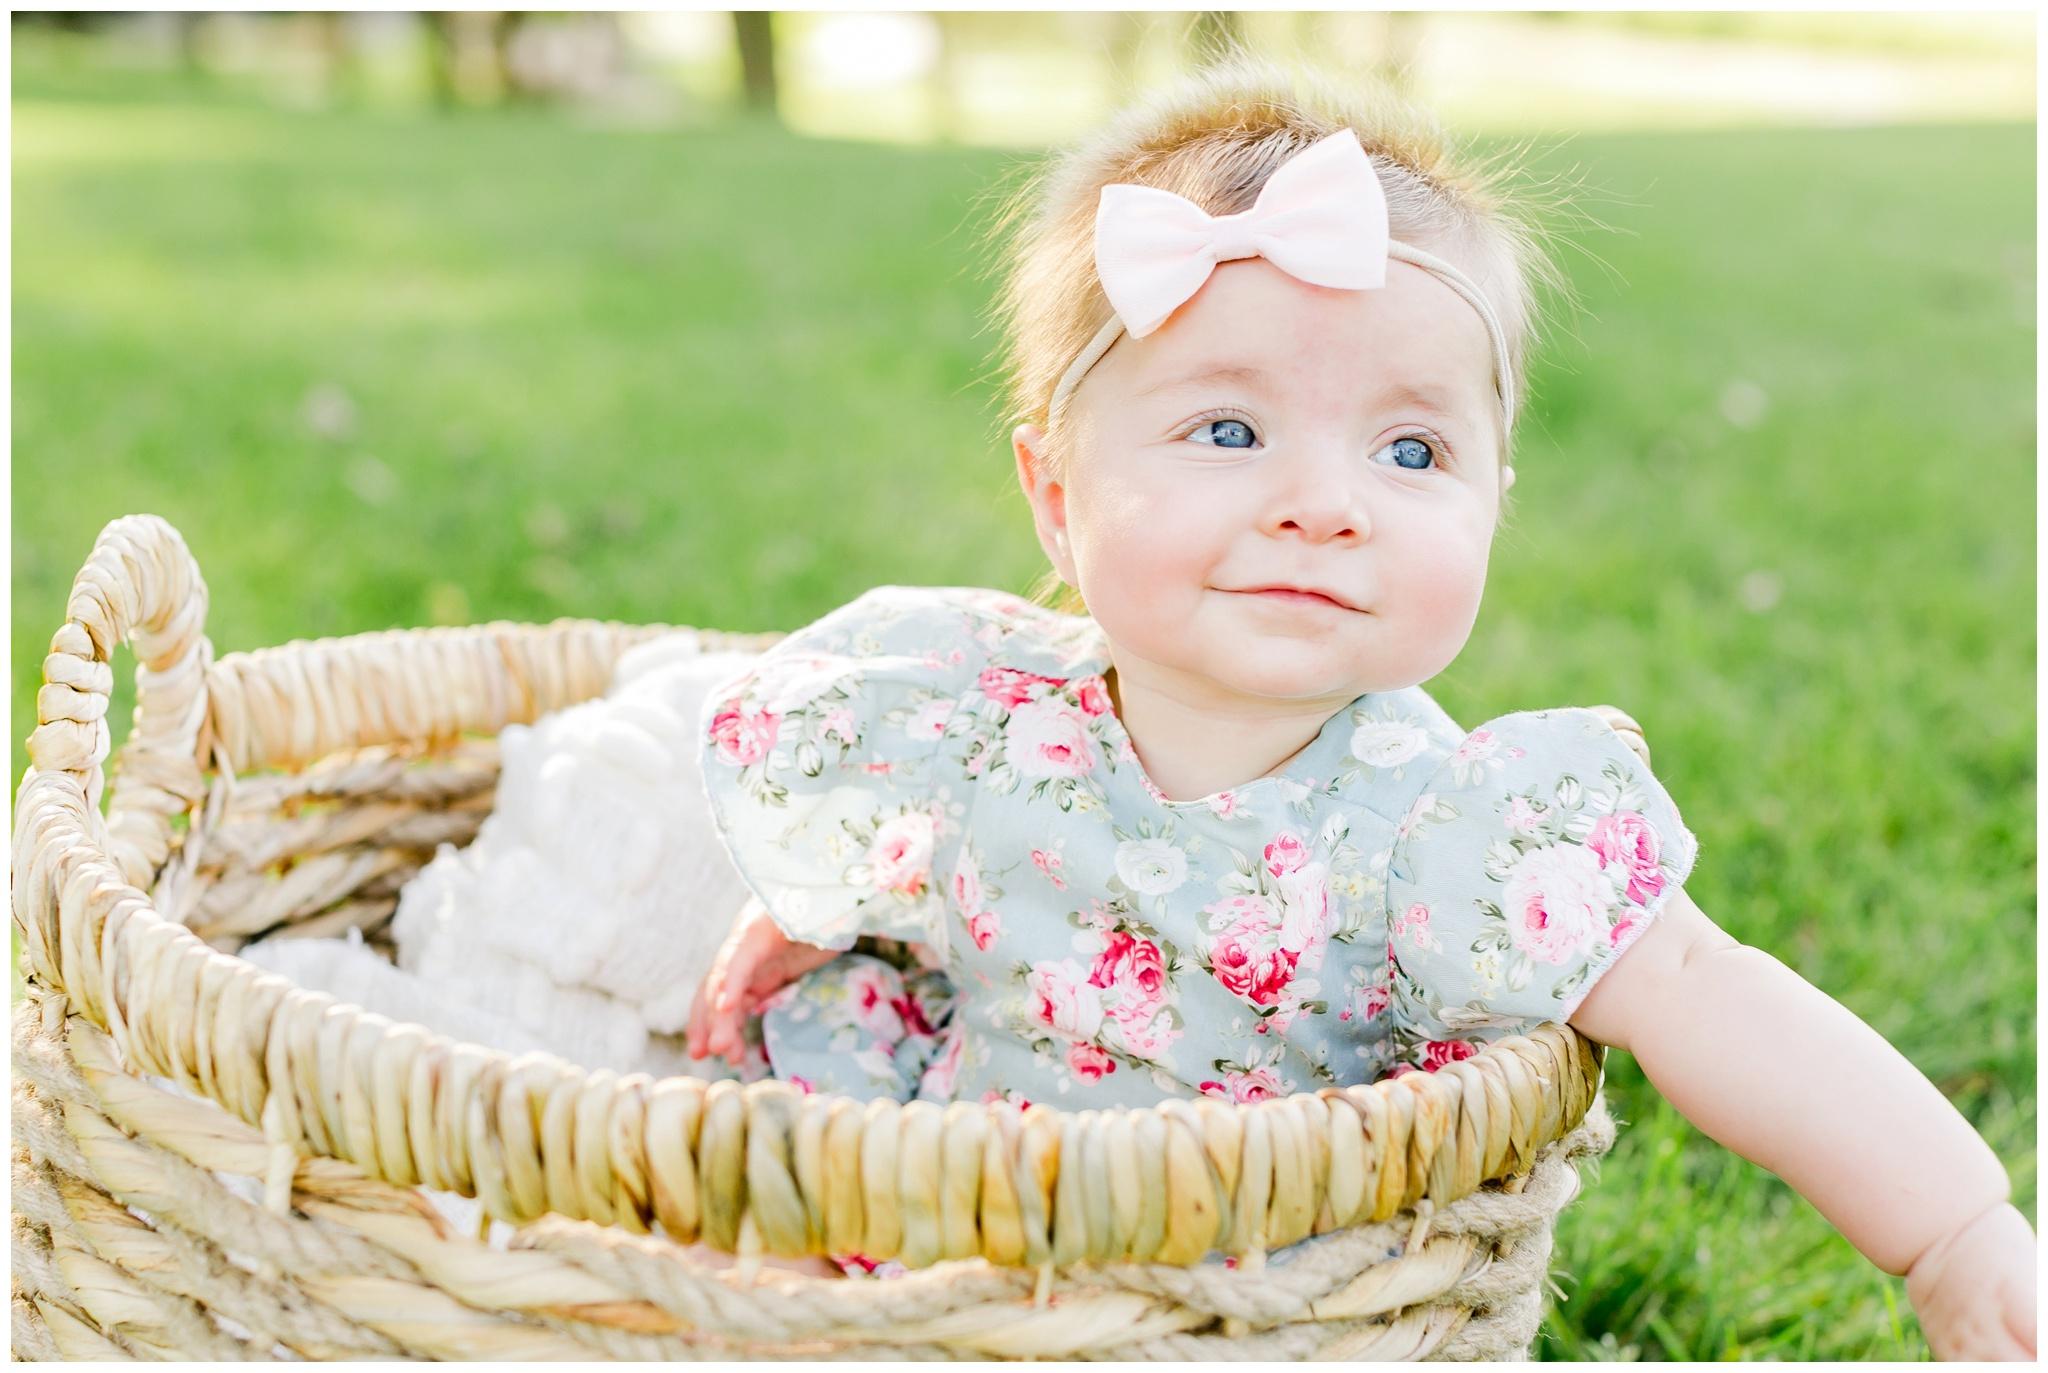 burke_park_family_session_madison_wisconsin_portrait_photographer_4520.jpg